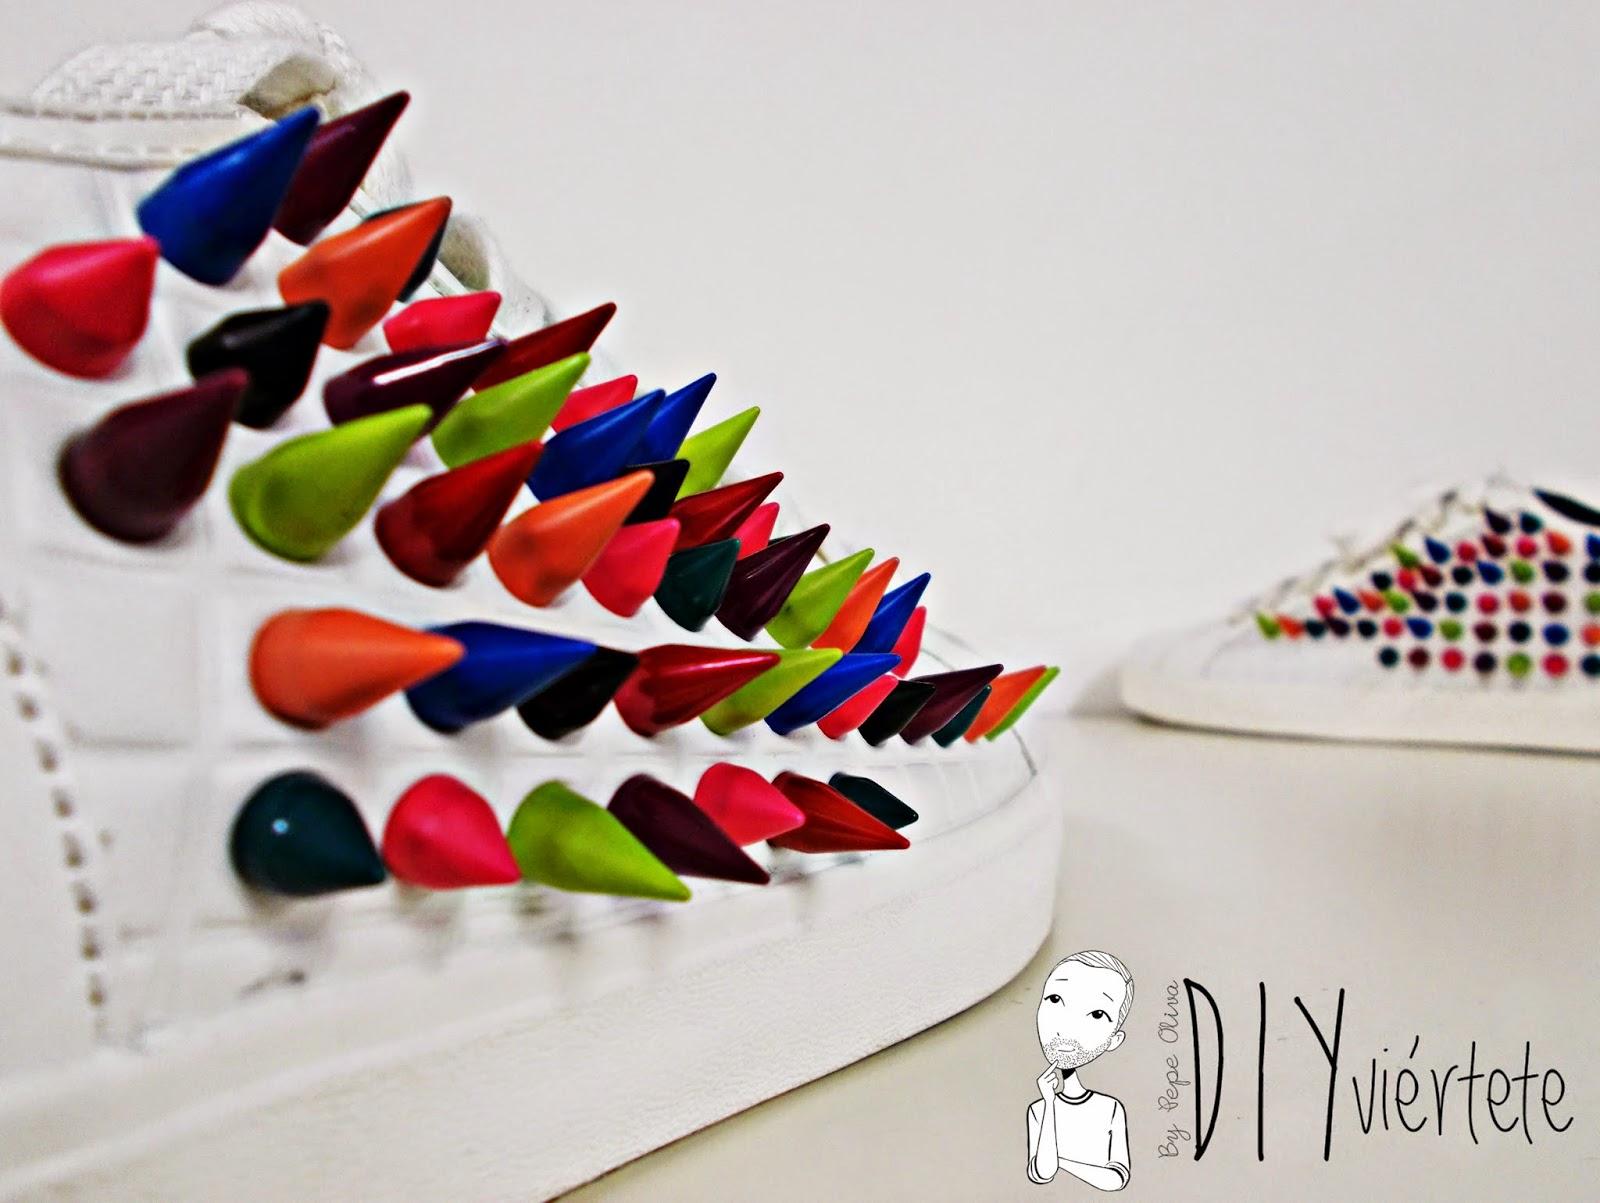 DIY-zapatillas-tunear-customizar-CHRISTIAN-LOUBOUTIN-zapatos-pinchos-esmaltes-pinta uñas-colores-3